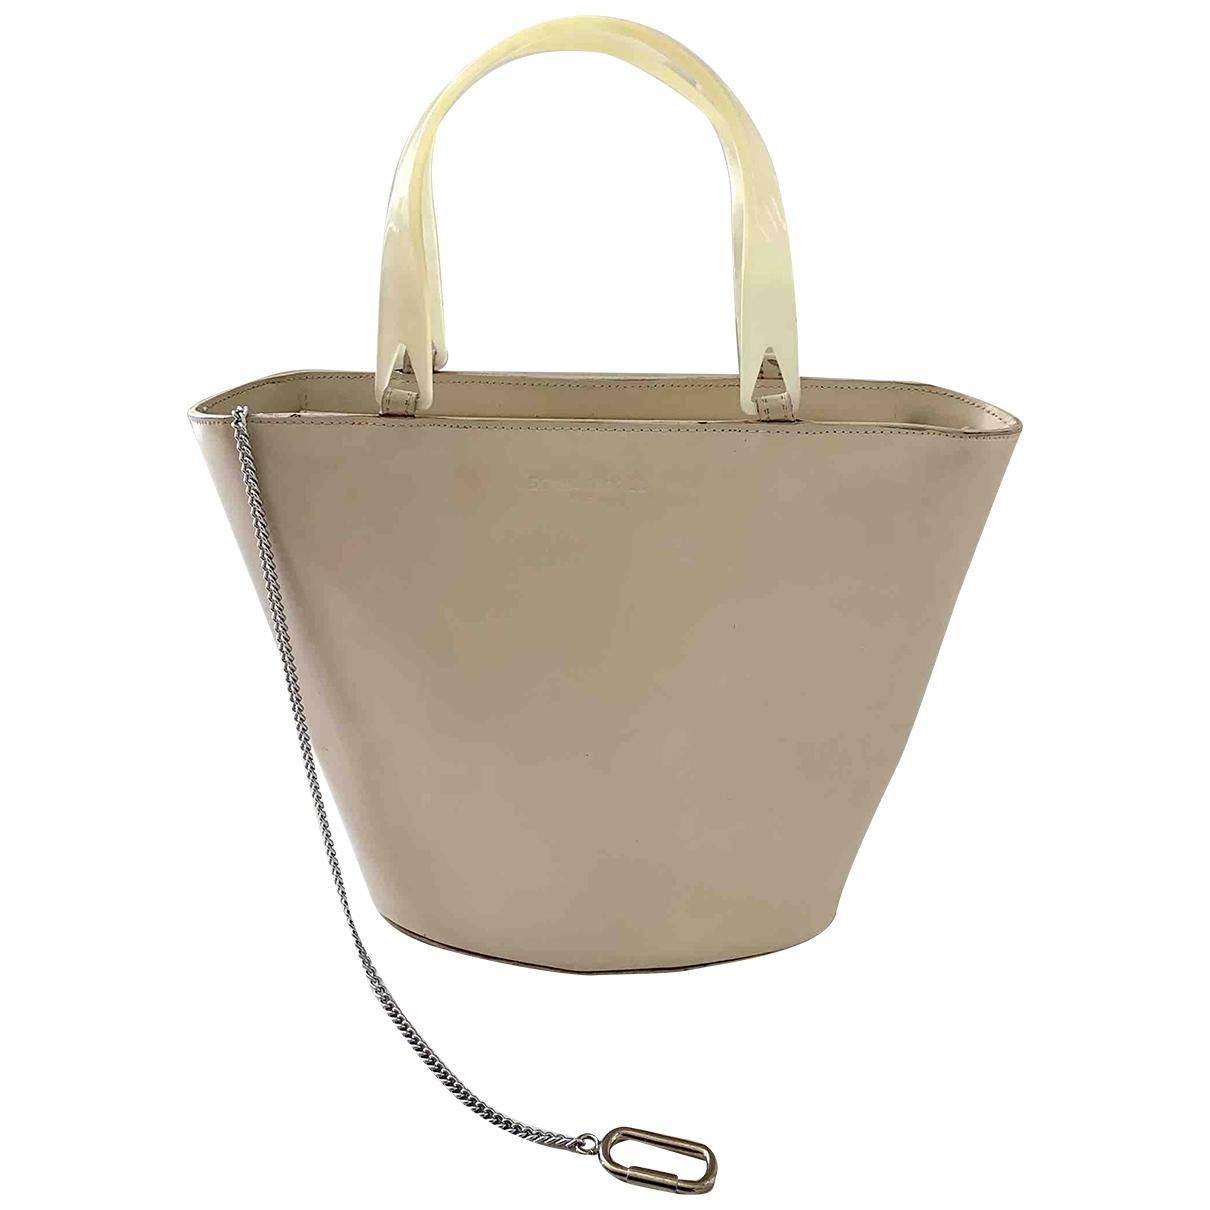 Sonia Rykiel \N Handtasche in  Ecru Leder